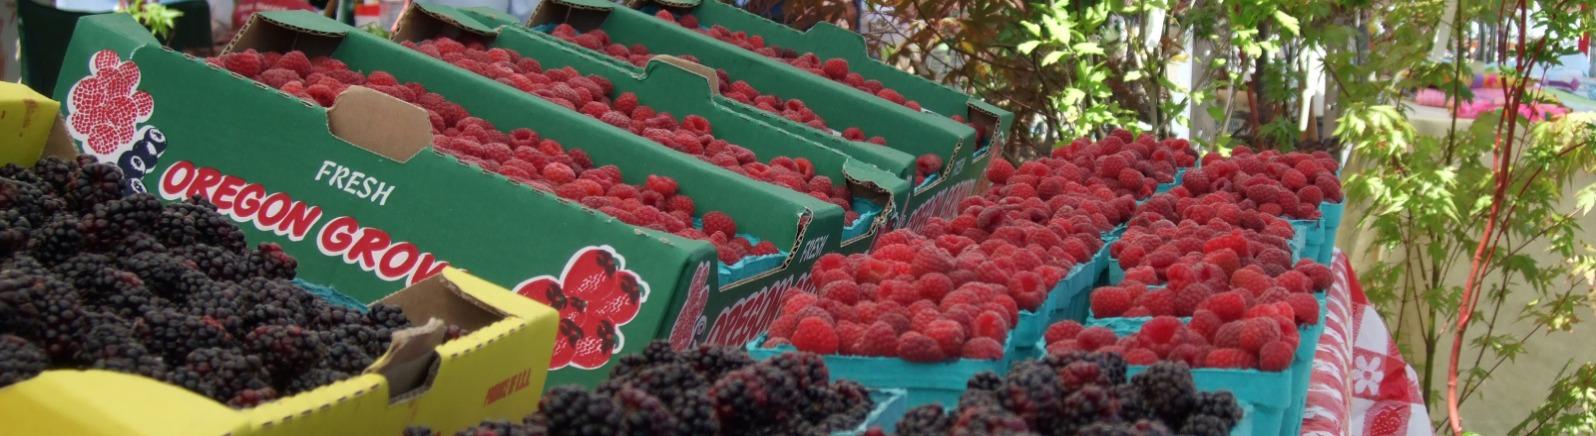 Boring Farmer's Market berries